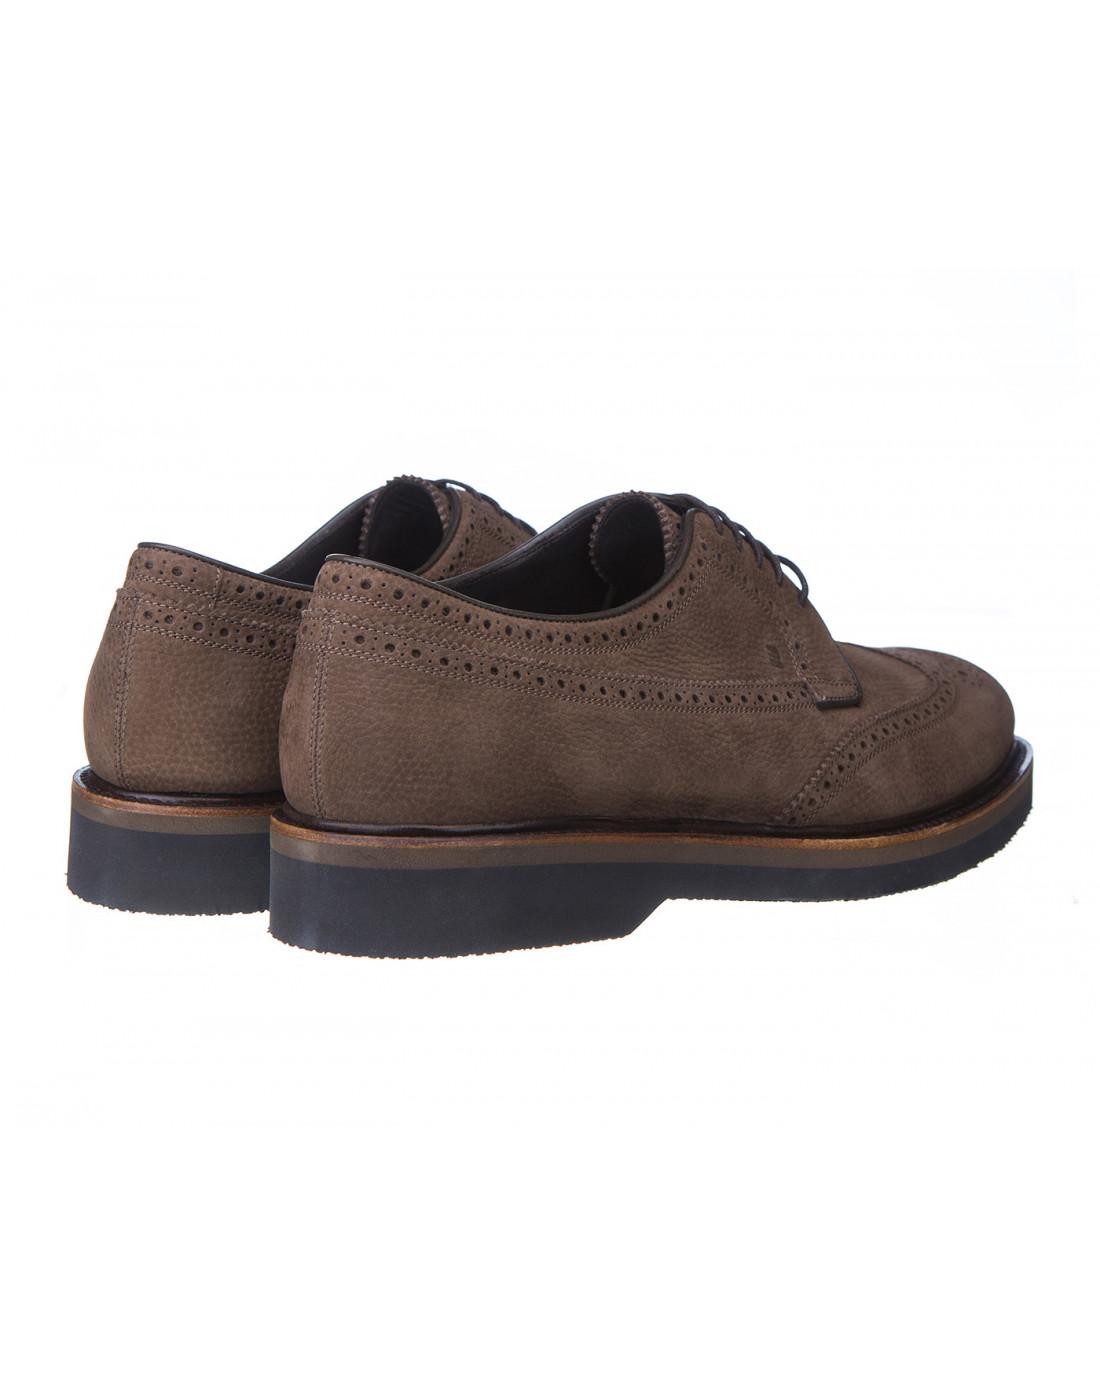 Туфли бежевые мужские Fratelli Rossetti S45900-3